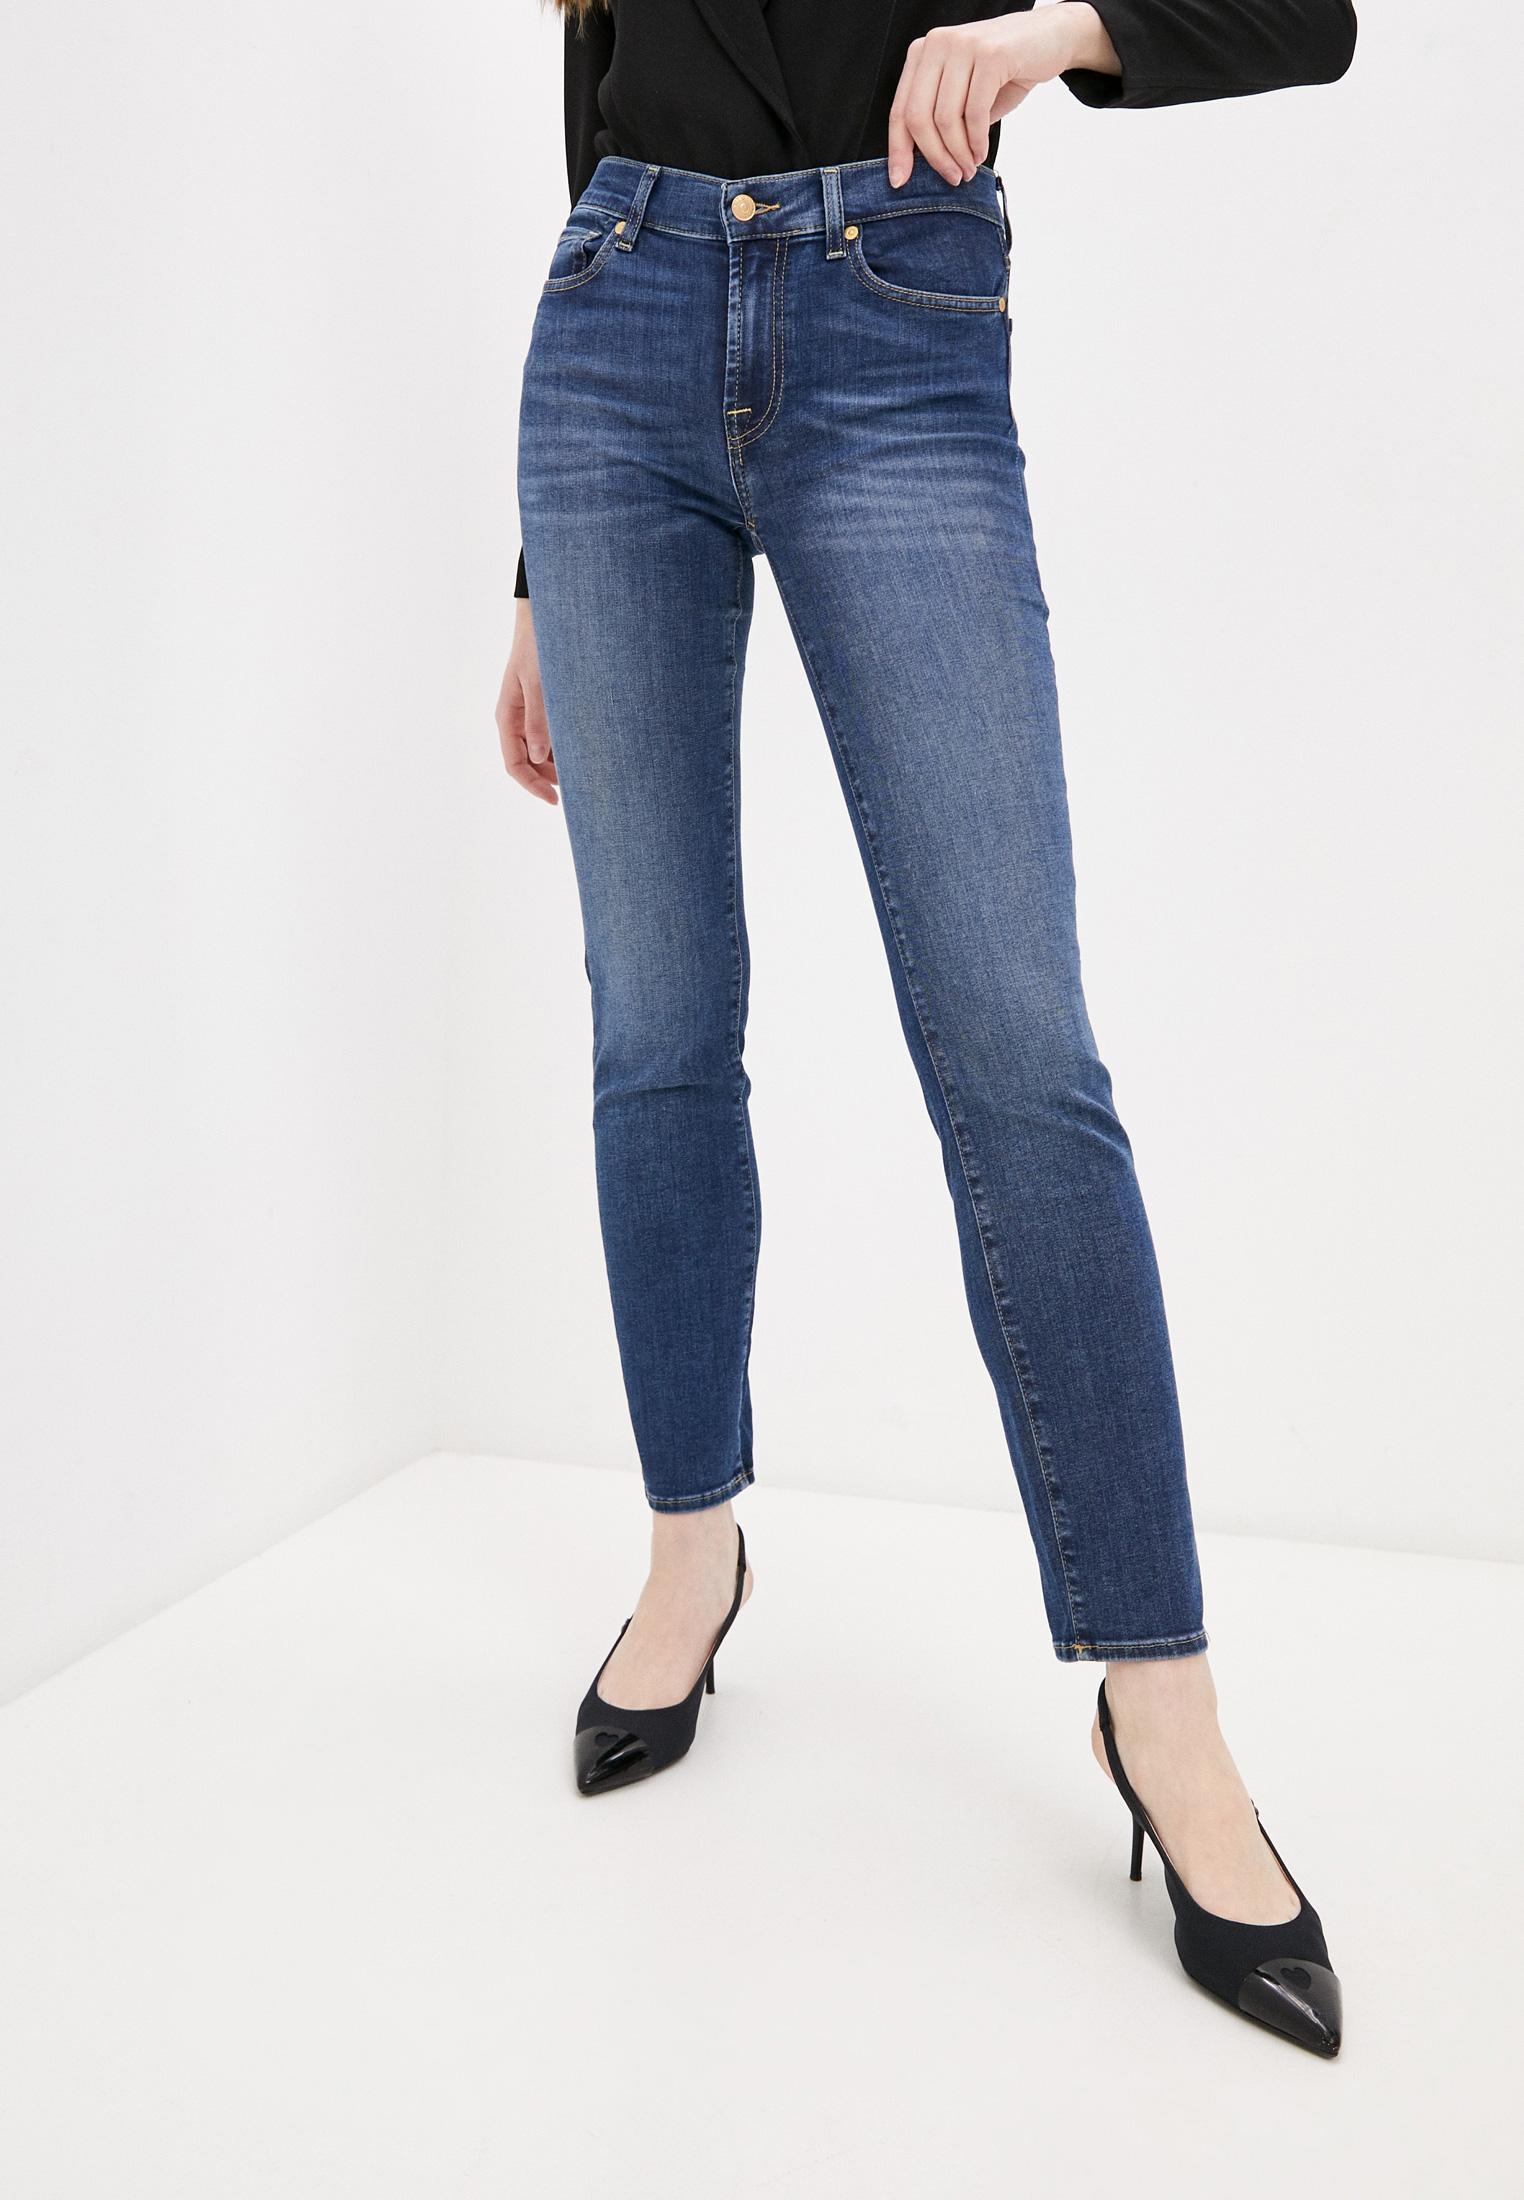 Зауженные джинсы 7 For All Mankind (7 Фо Олл Мэнкайнд) Джинсы 7 For All Mankind